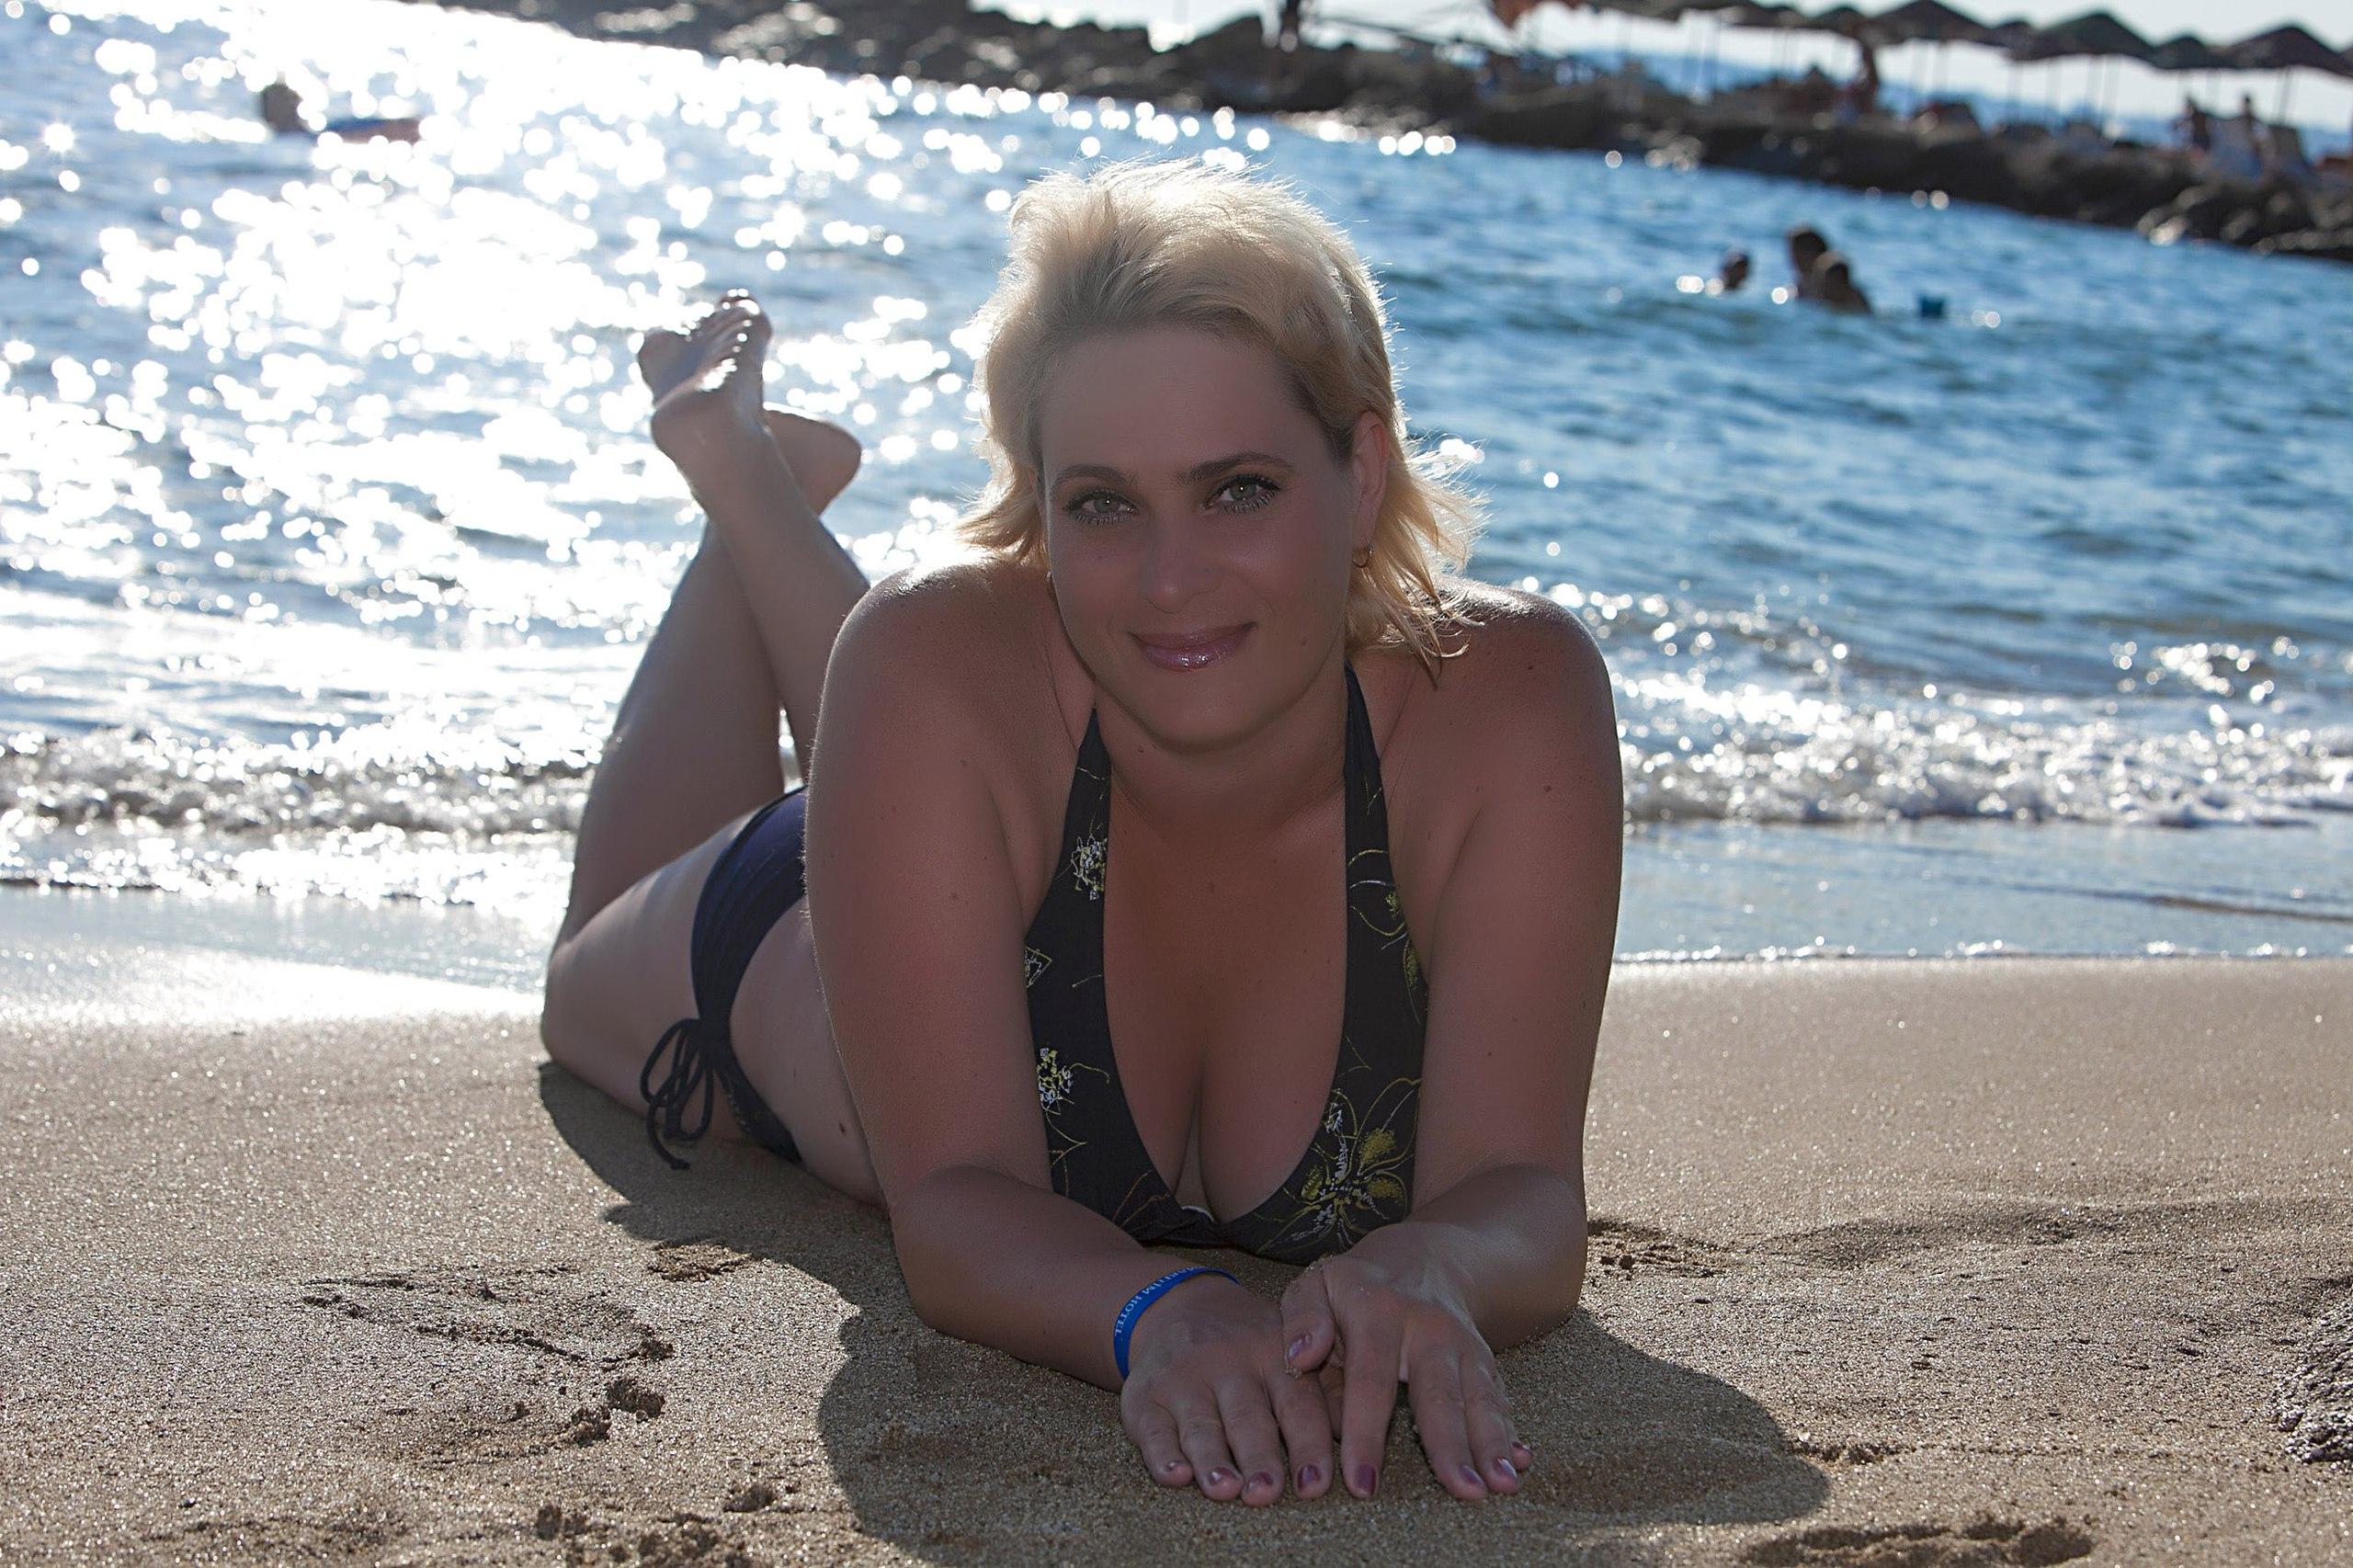 Фото женщин за 40 (23 фото) - Иринка, 43 года, Санкт-Петербург